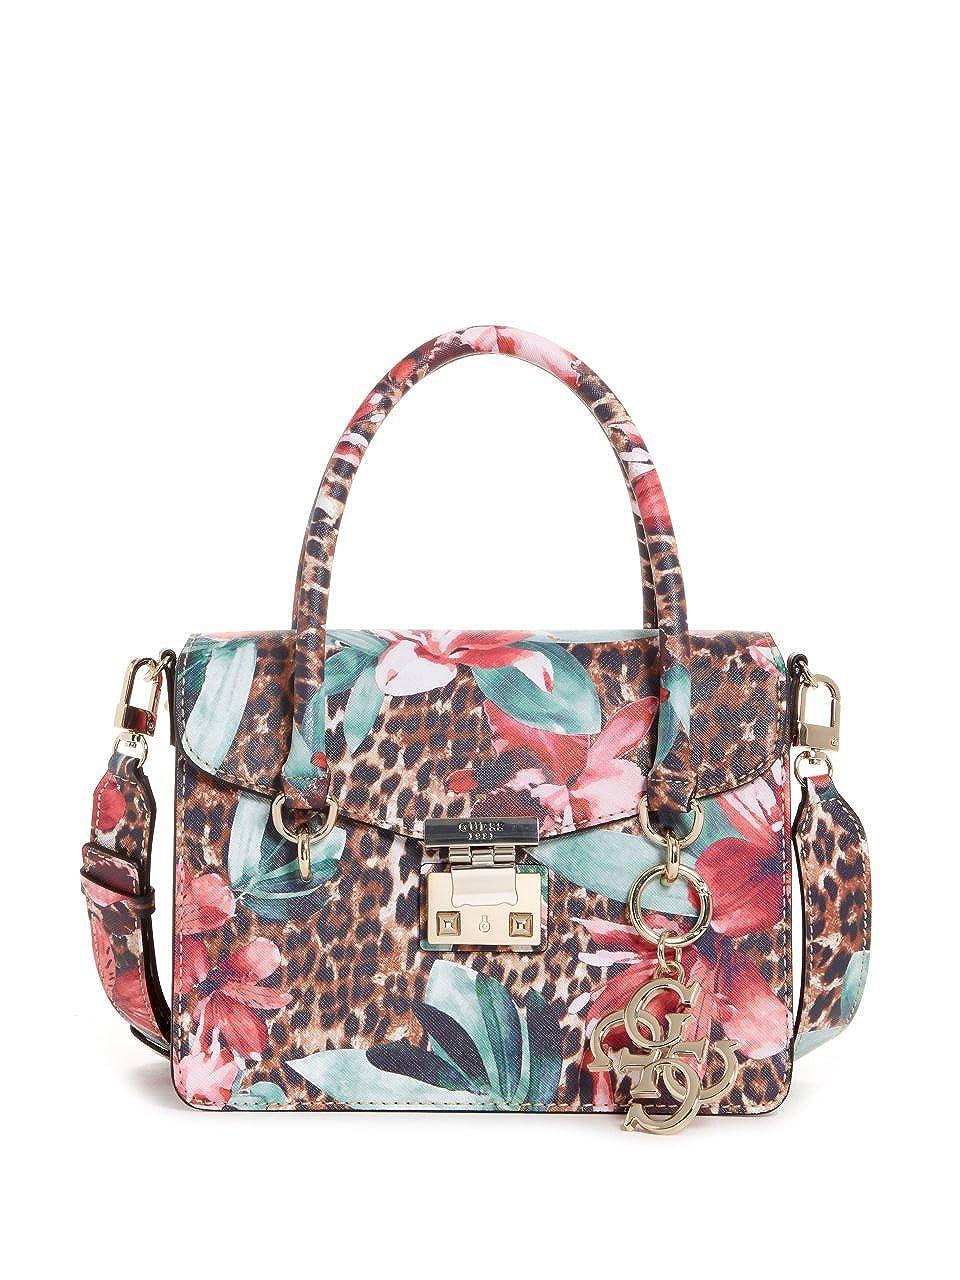 GUESS Orchid Leopard Printed Satchel Crossbody Bag